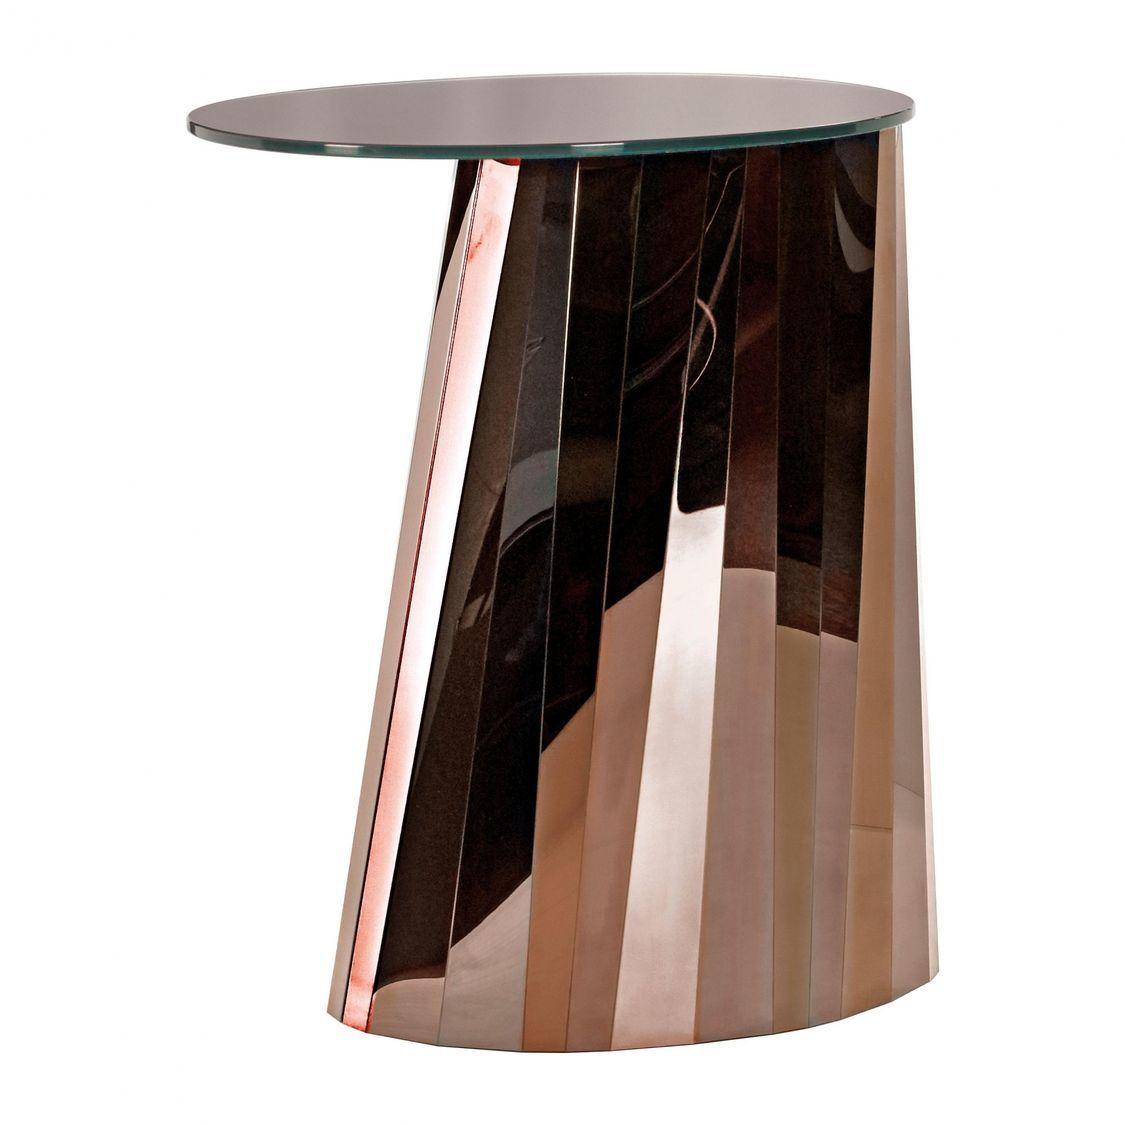 pli table d 39 appoint haute classicon. Black Bedroom Furniture Sets. Home Design Ideas